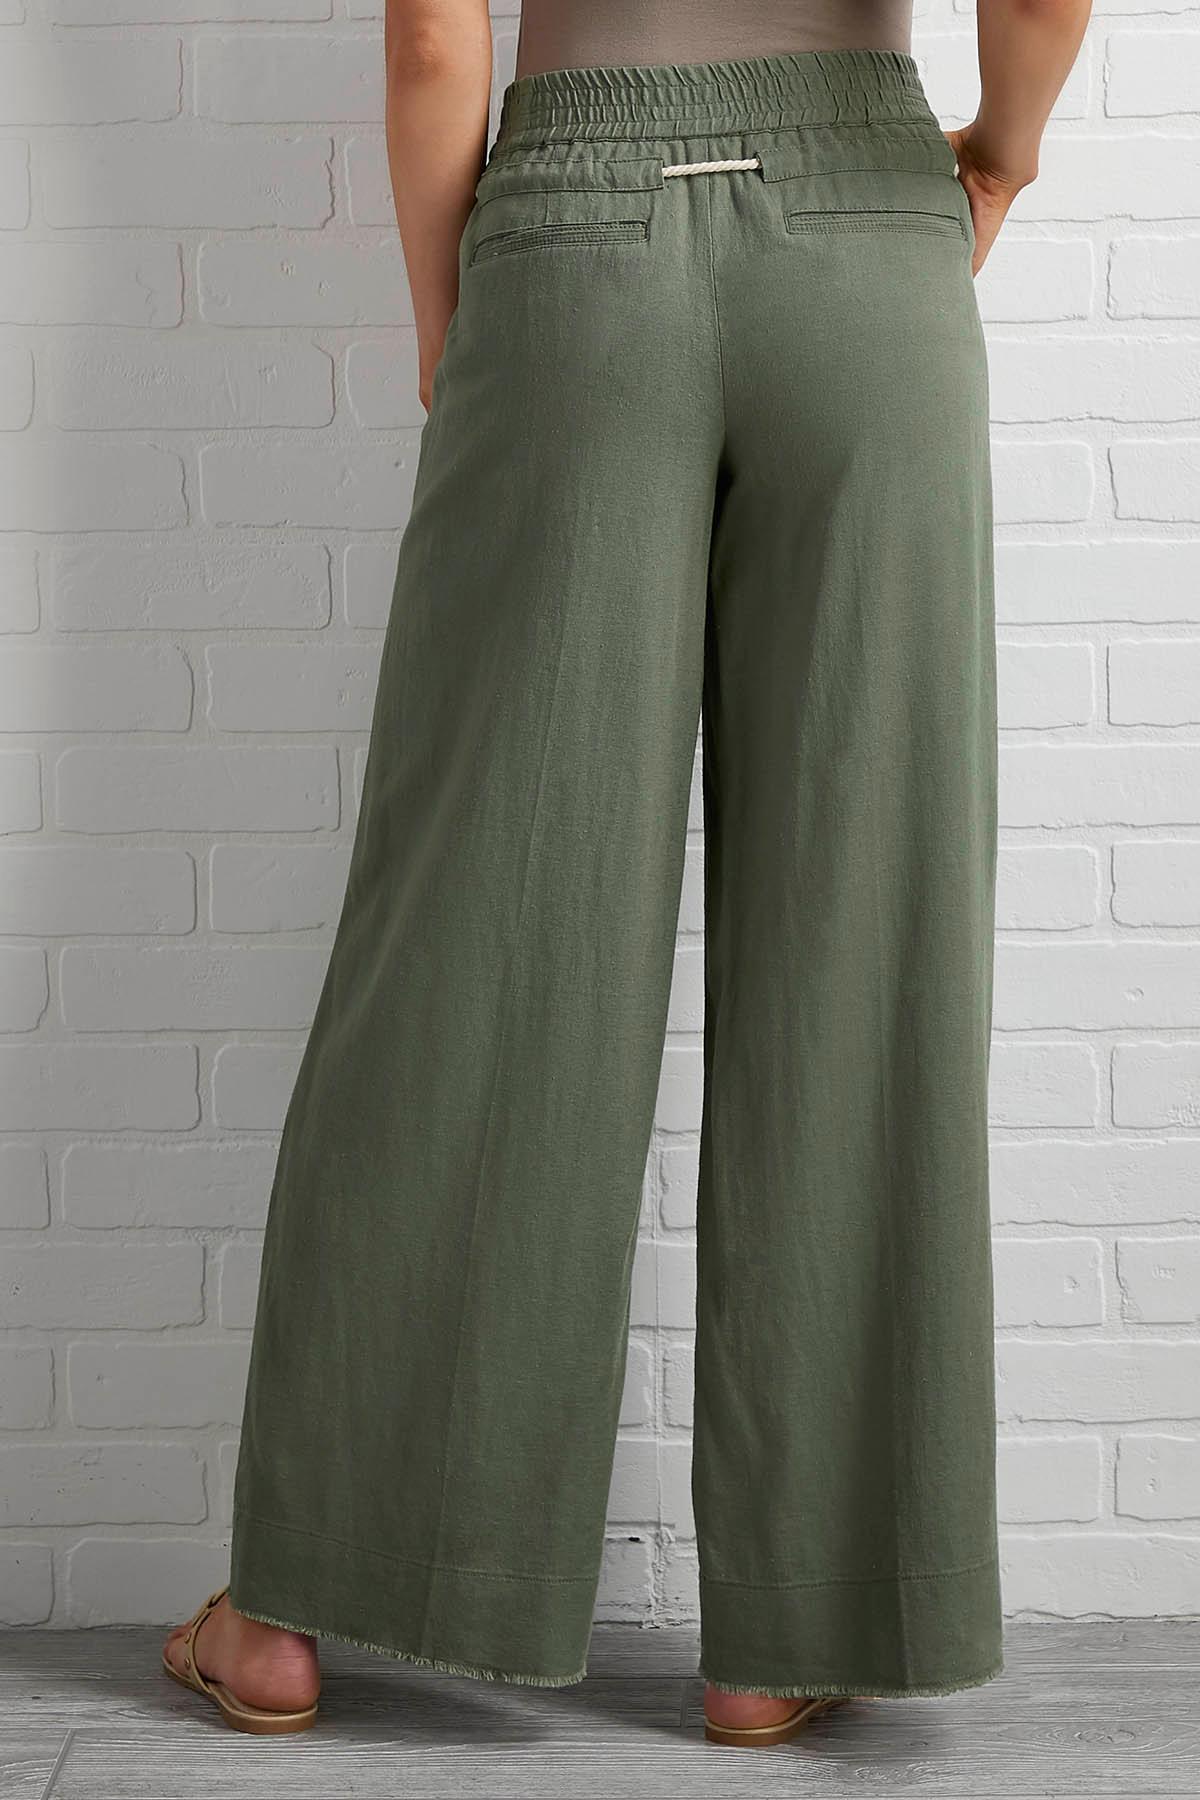 Casual Friday Pants